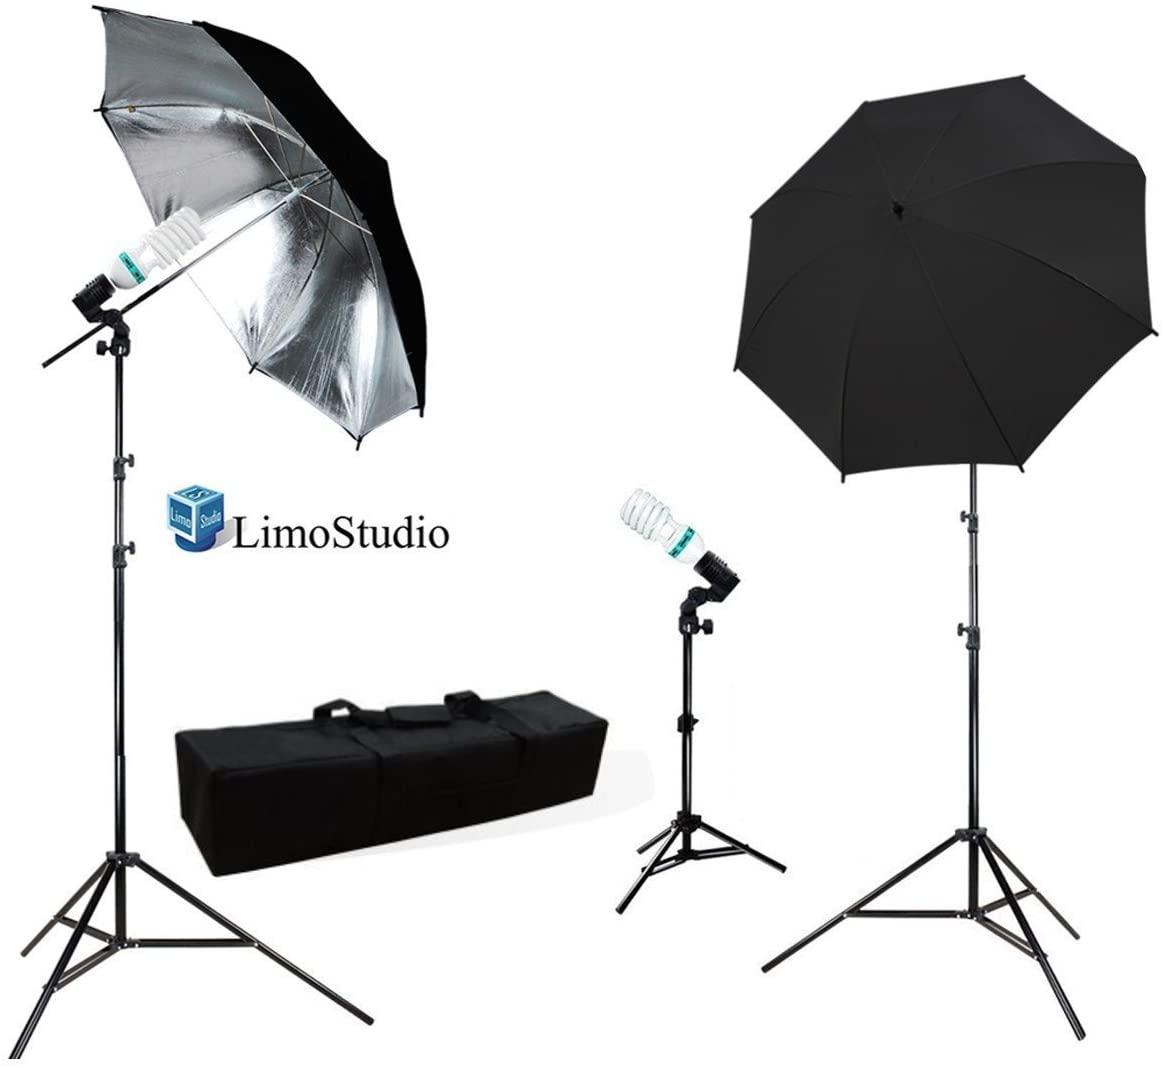 LimoStudio Photography Photo Portrait Studio 600W Triple Continuous Umbrella Lighting Kit - 2x Black / Silver Umbrella Lighting, 1x Table Top Mini Lighting Kit, AGG1211